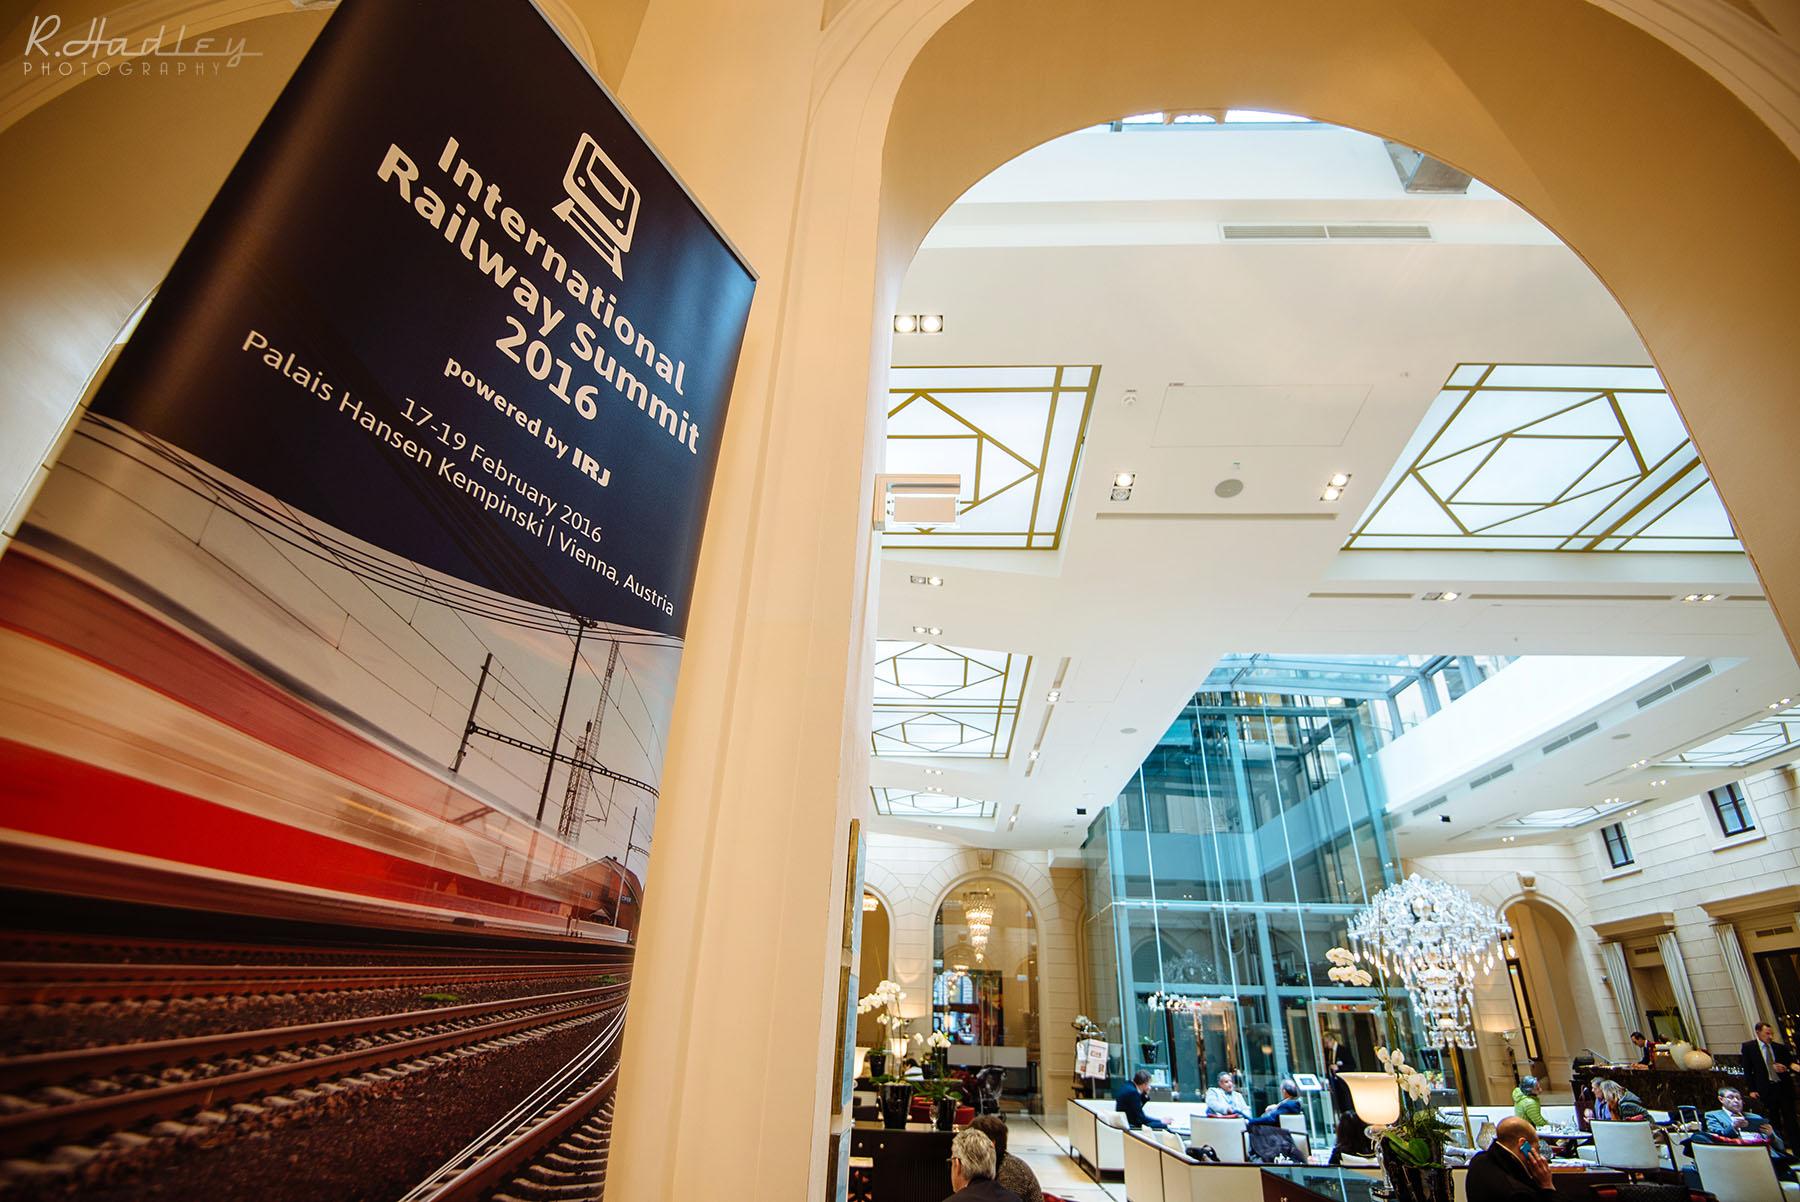 Event photography at the Palais Hansen Kempinski, Vienna, Austria